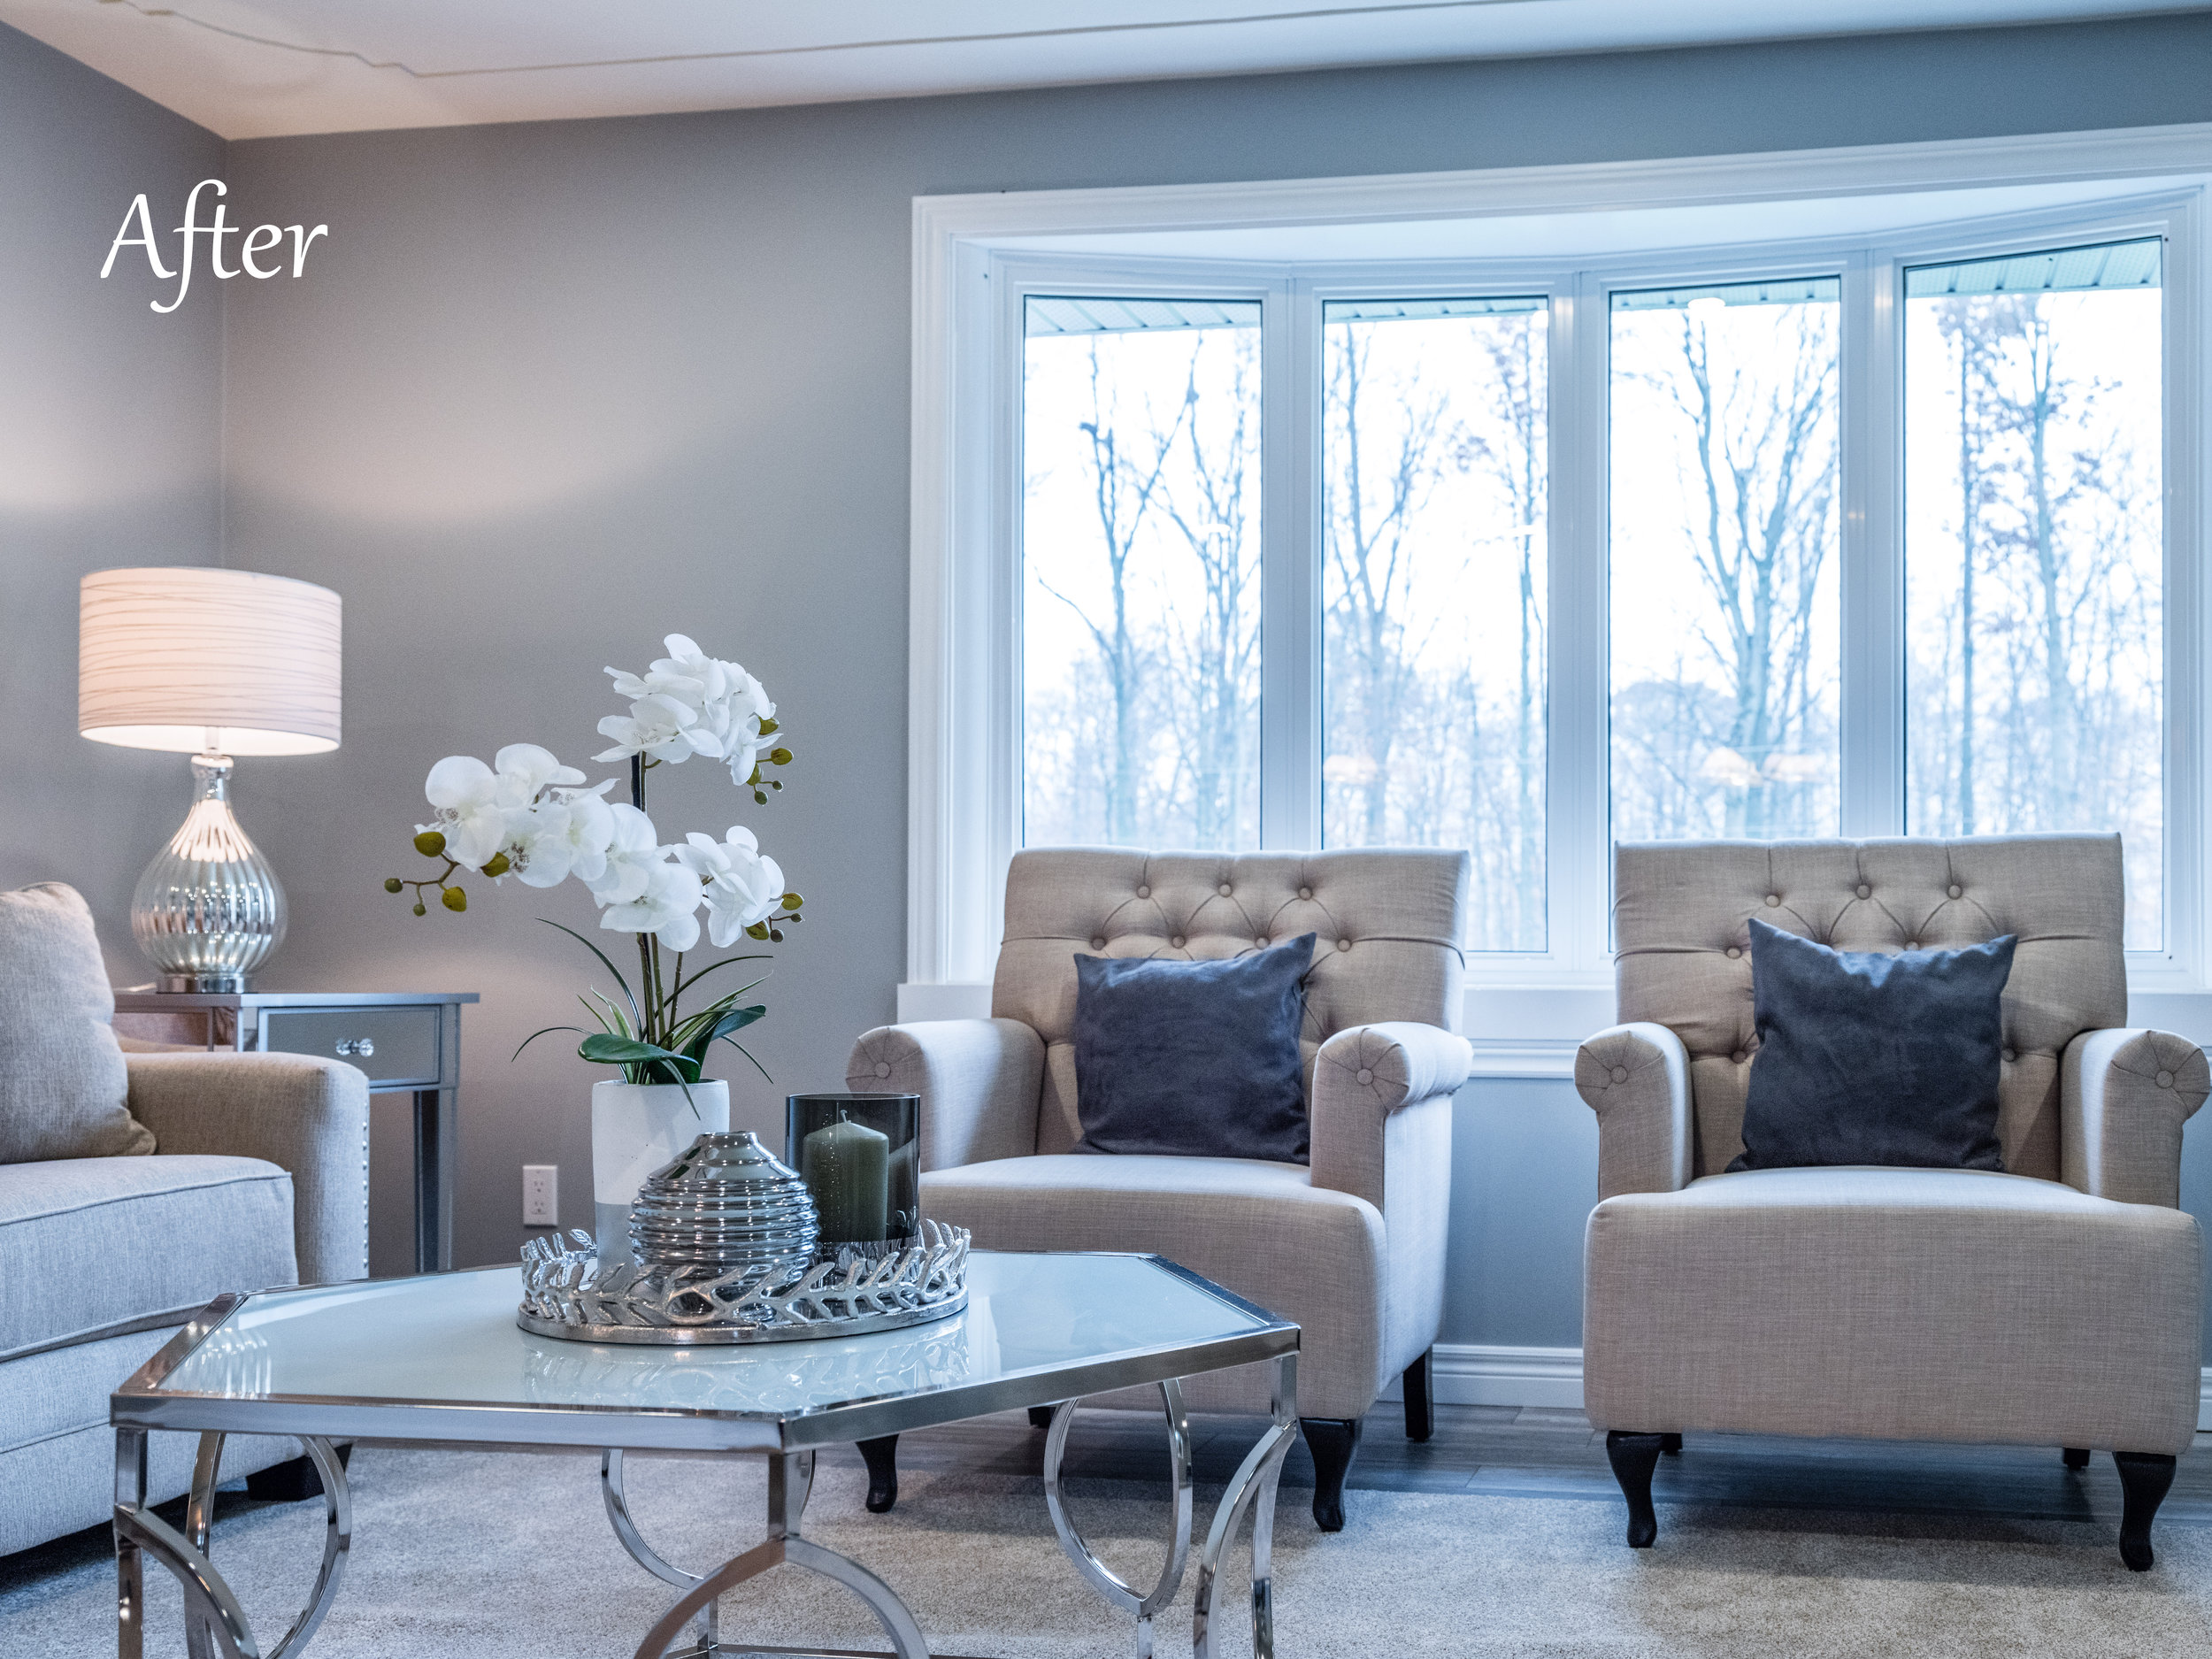 Livingroom 3 - After 2.jpg